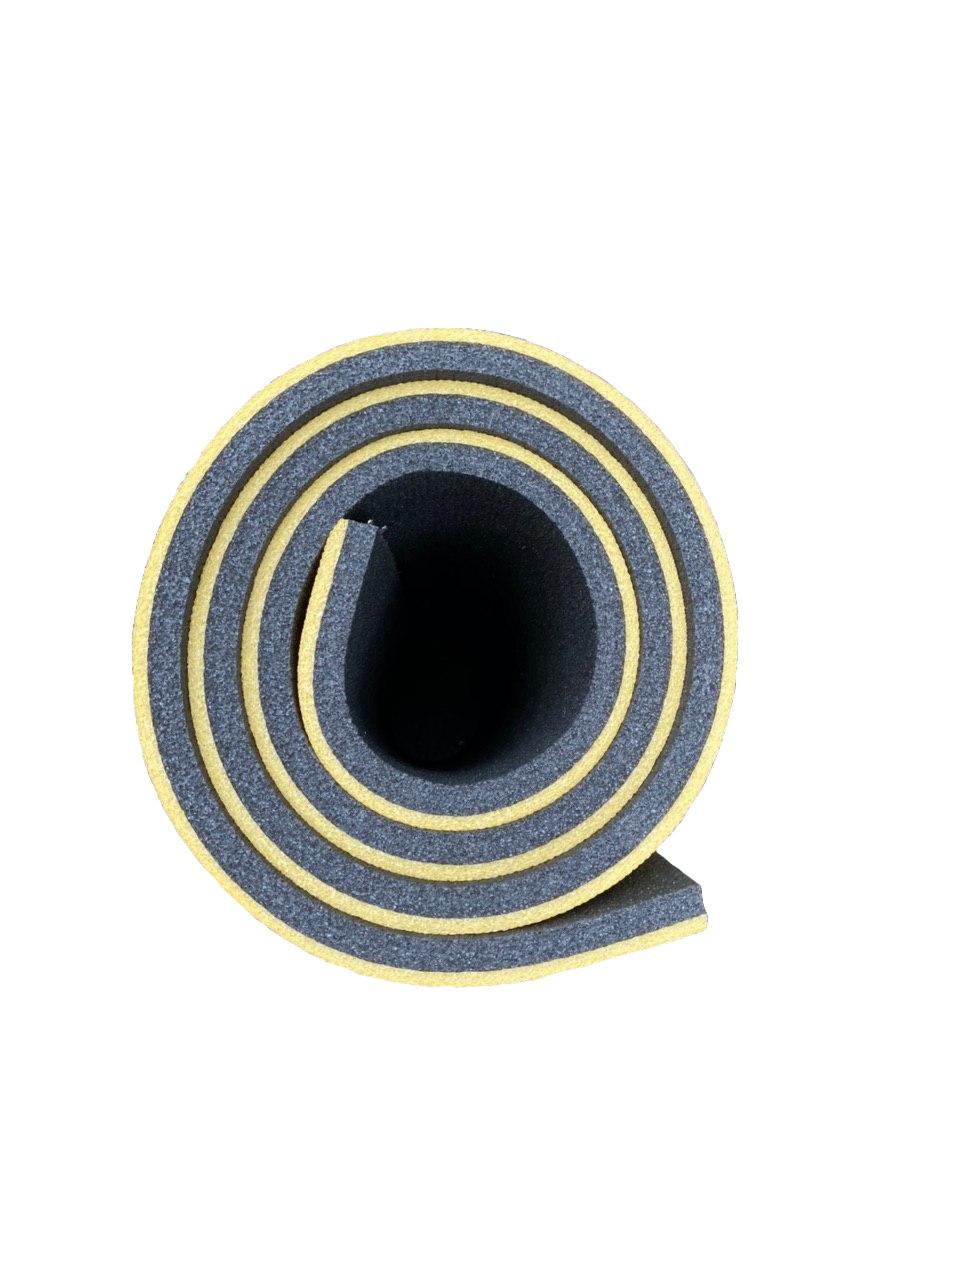 Каремат туристический, желто-серый, т. 16 мм, размер 60х180 см, производитель Украина, TERMOIZOL®